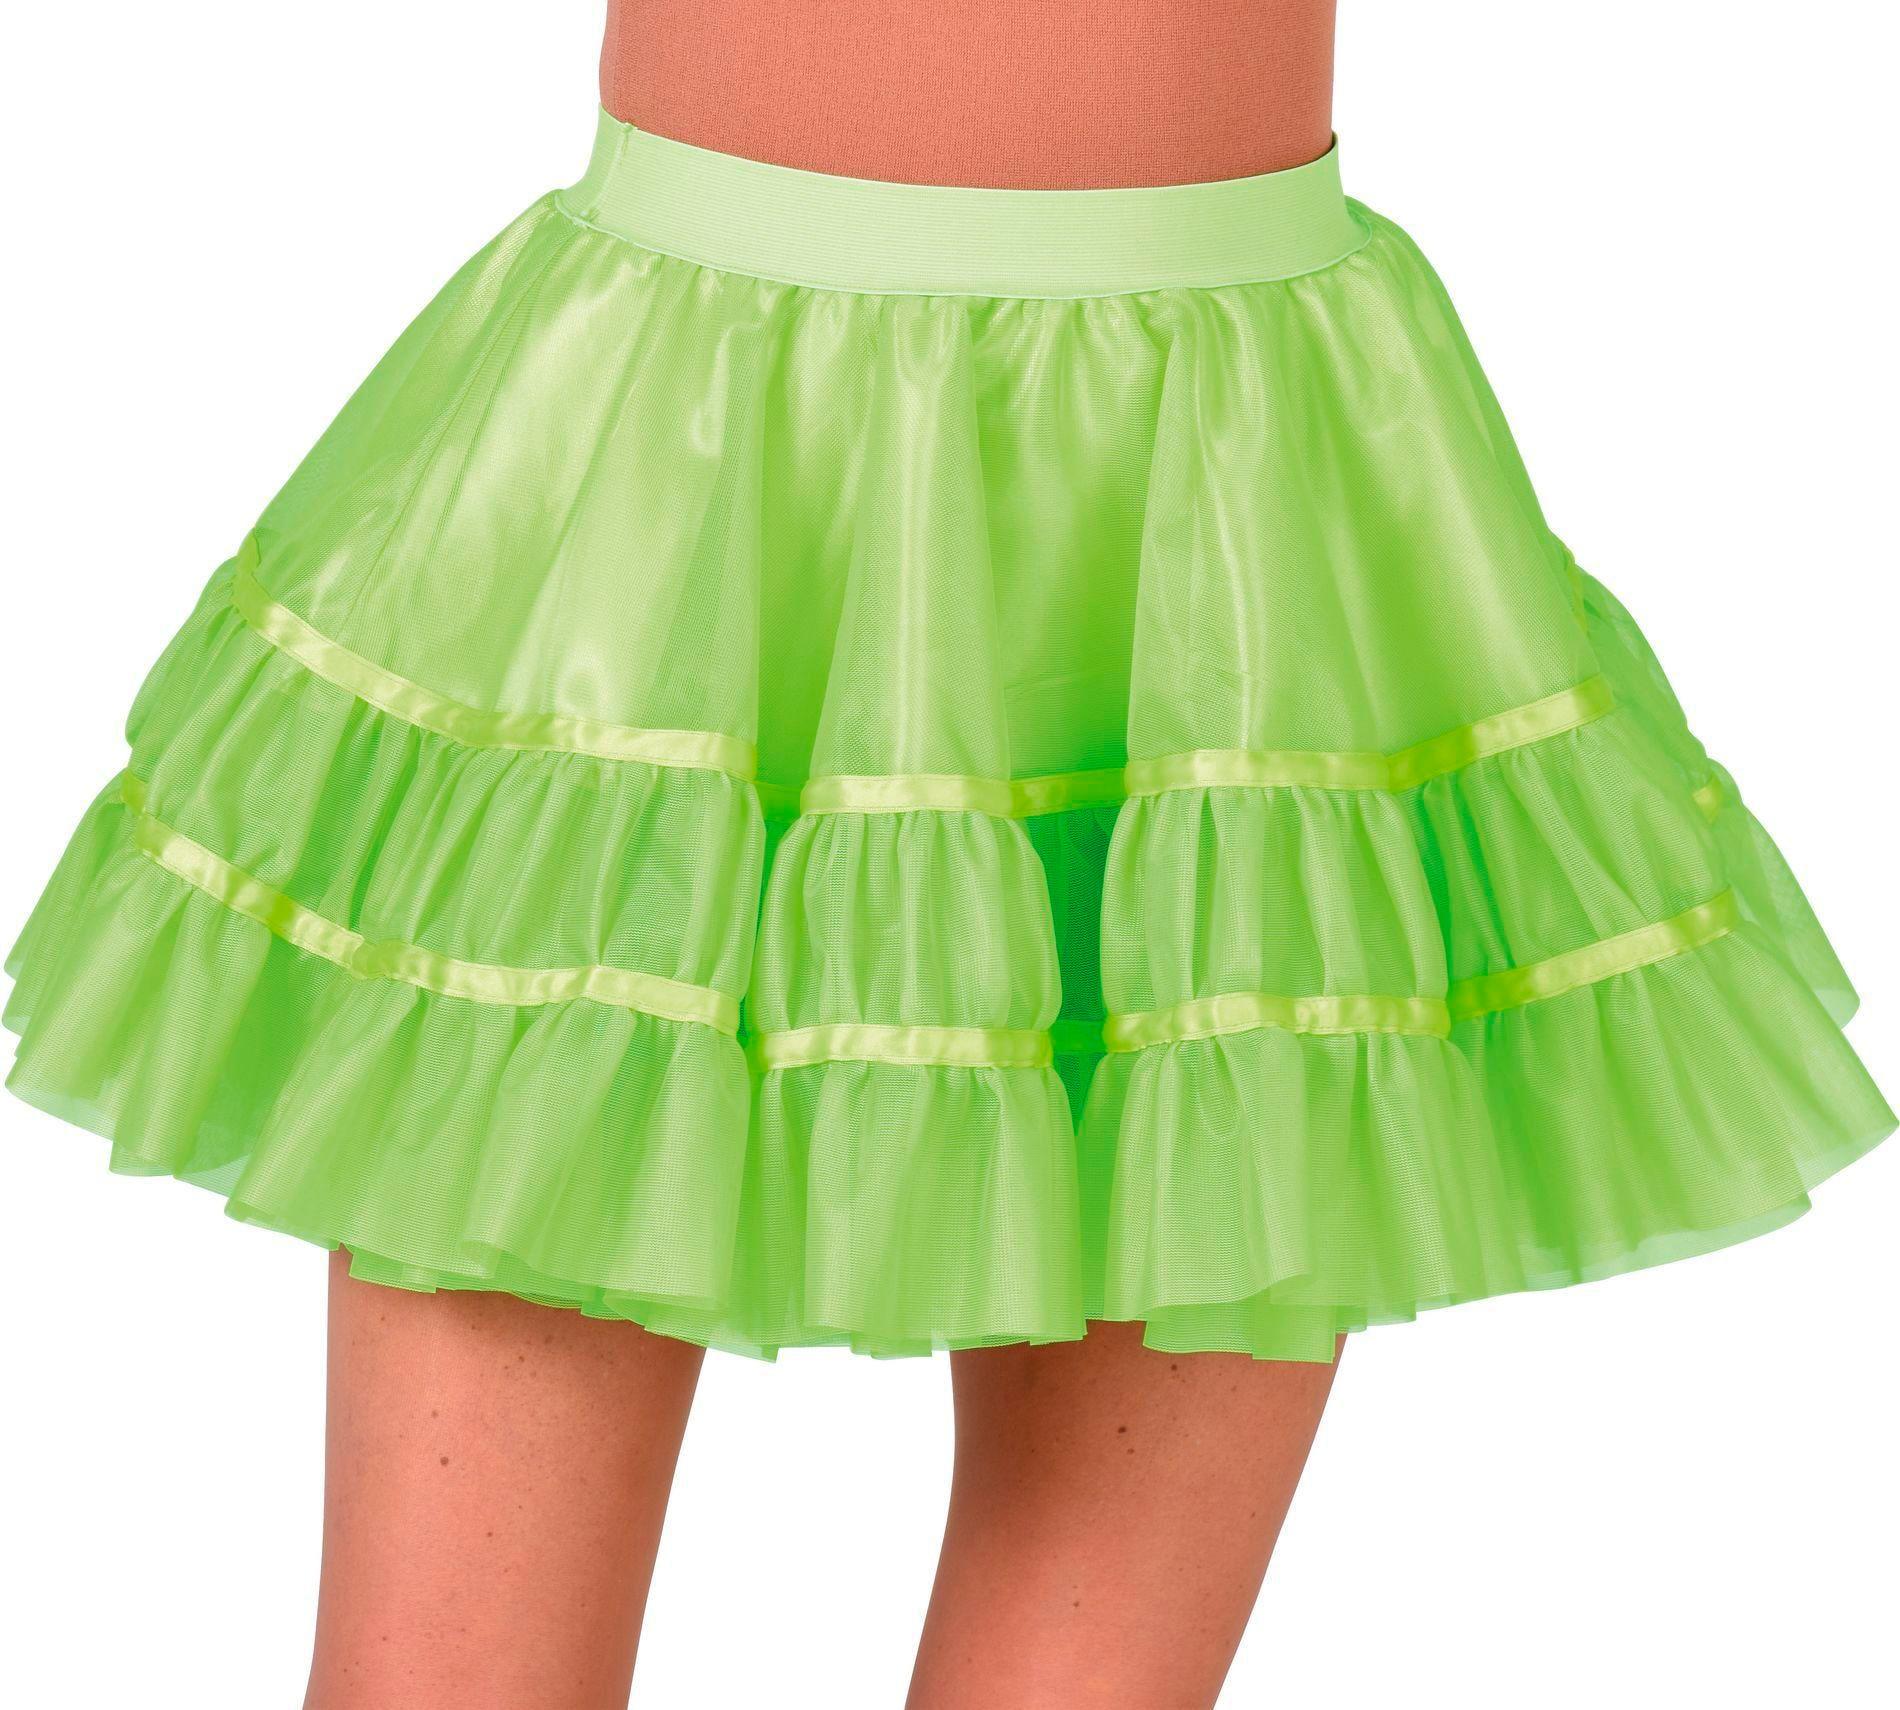 Groene petticoat vrouwen